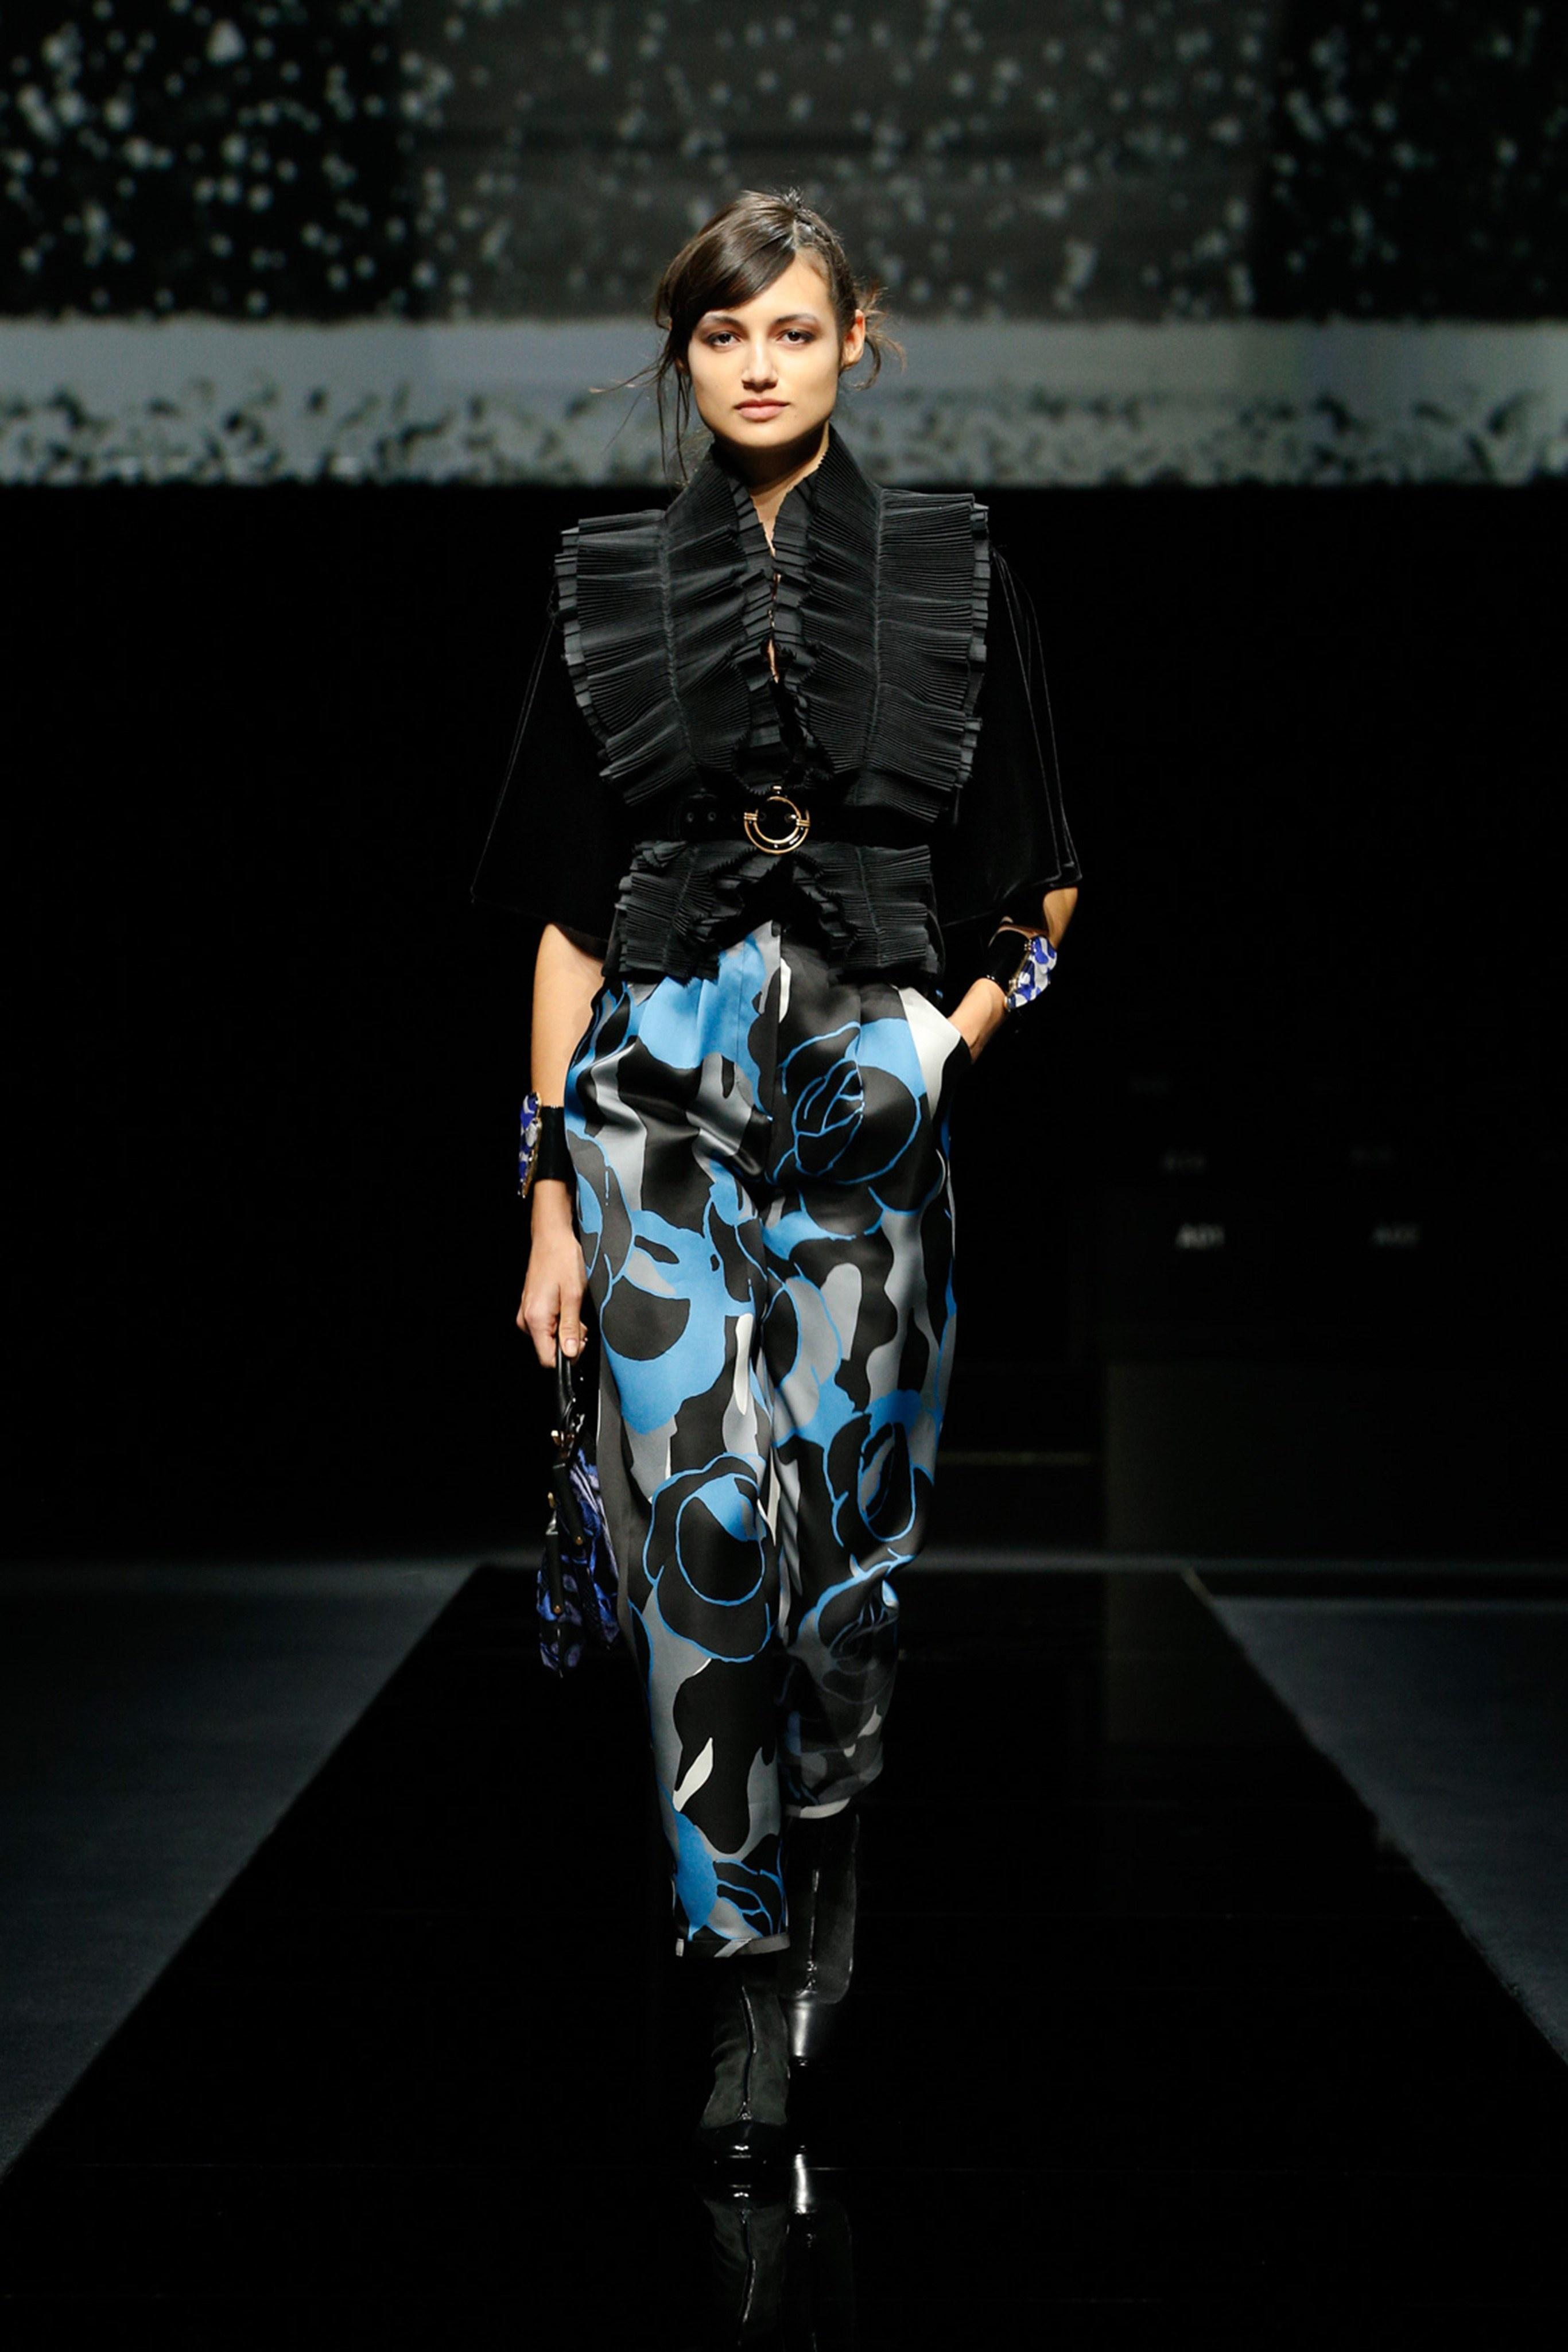 Khong co khach moi den Milan Fashion Week vi lo ngai virus corona hinh anh 3 g1.jpg